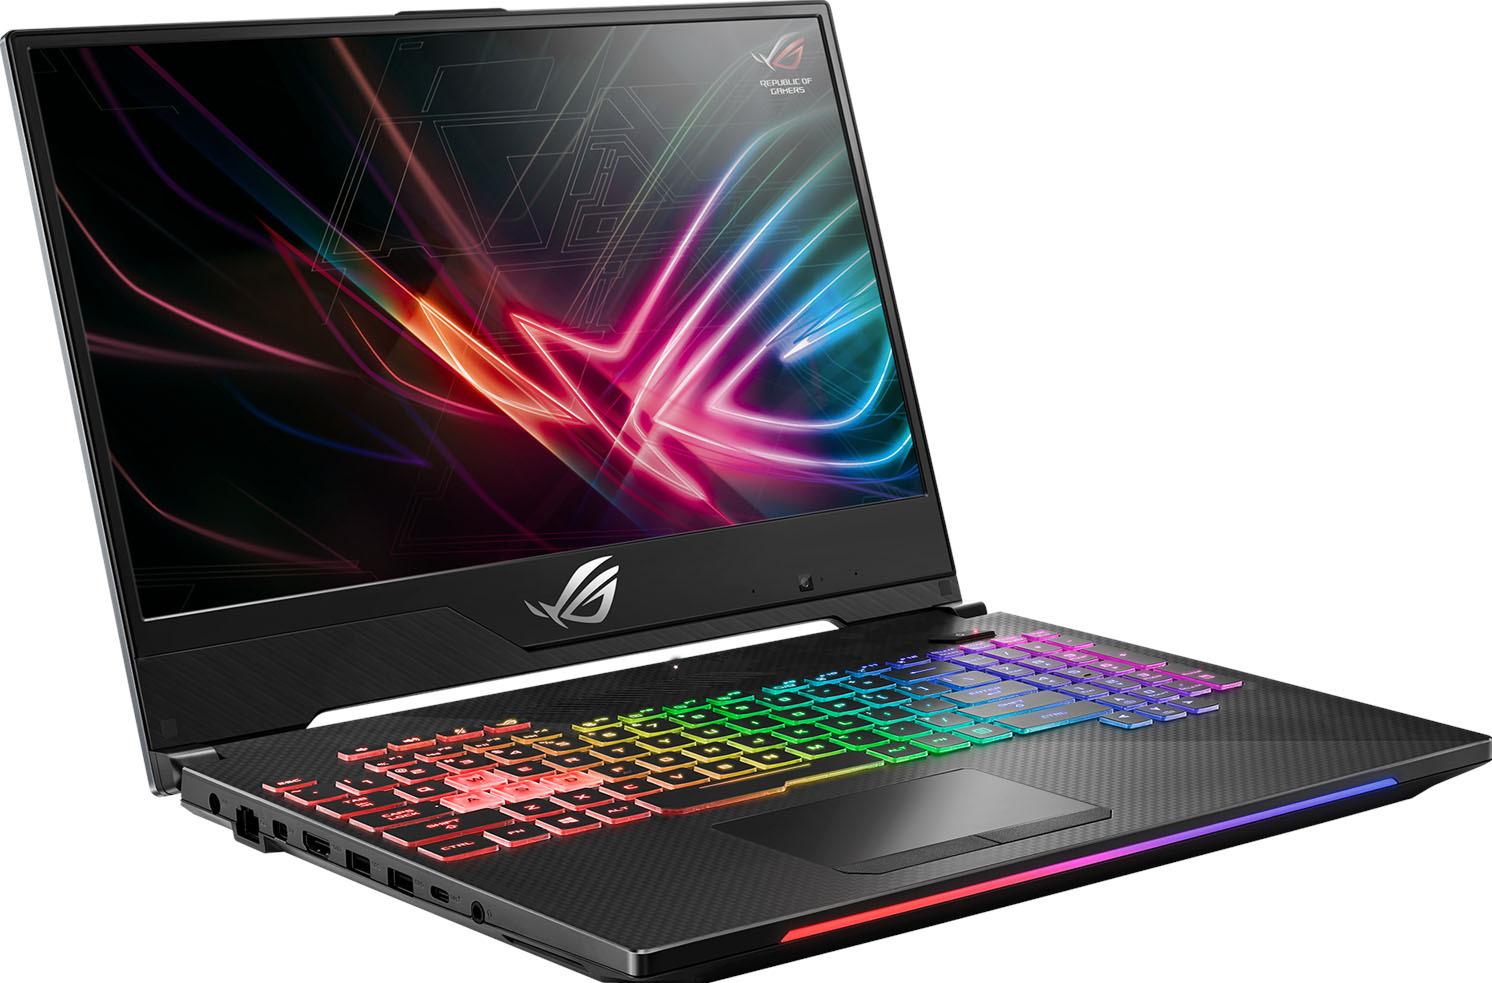 "17.3"" Игровой ноутбук ASUS ROG Strix SCAR II GL704GM 90NR00N1-M01220, темно-серый, серый"